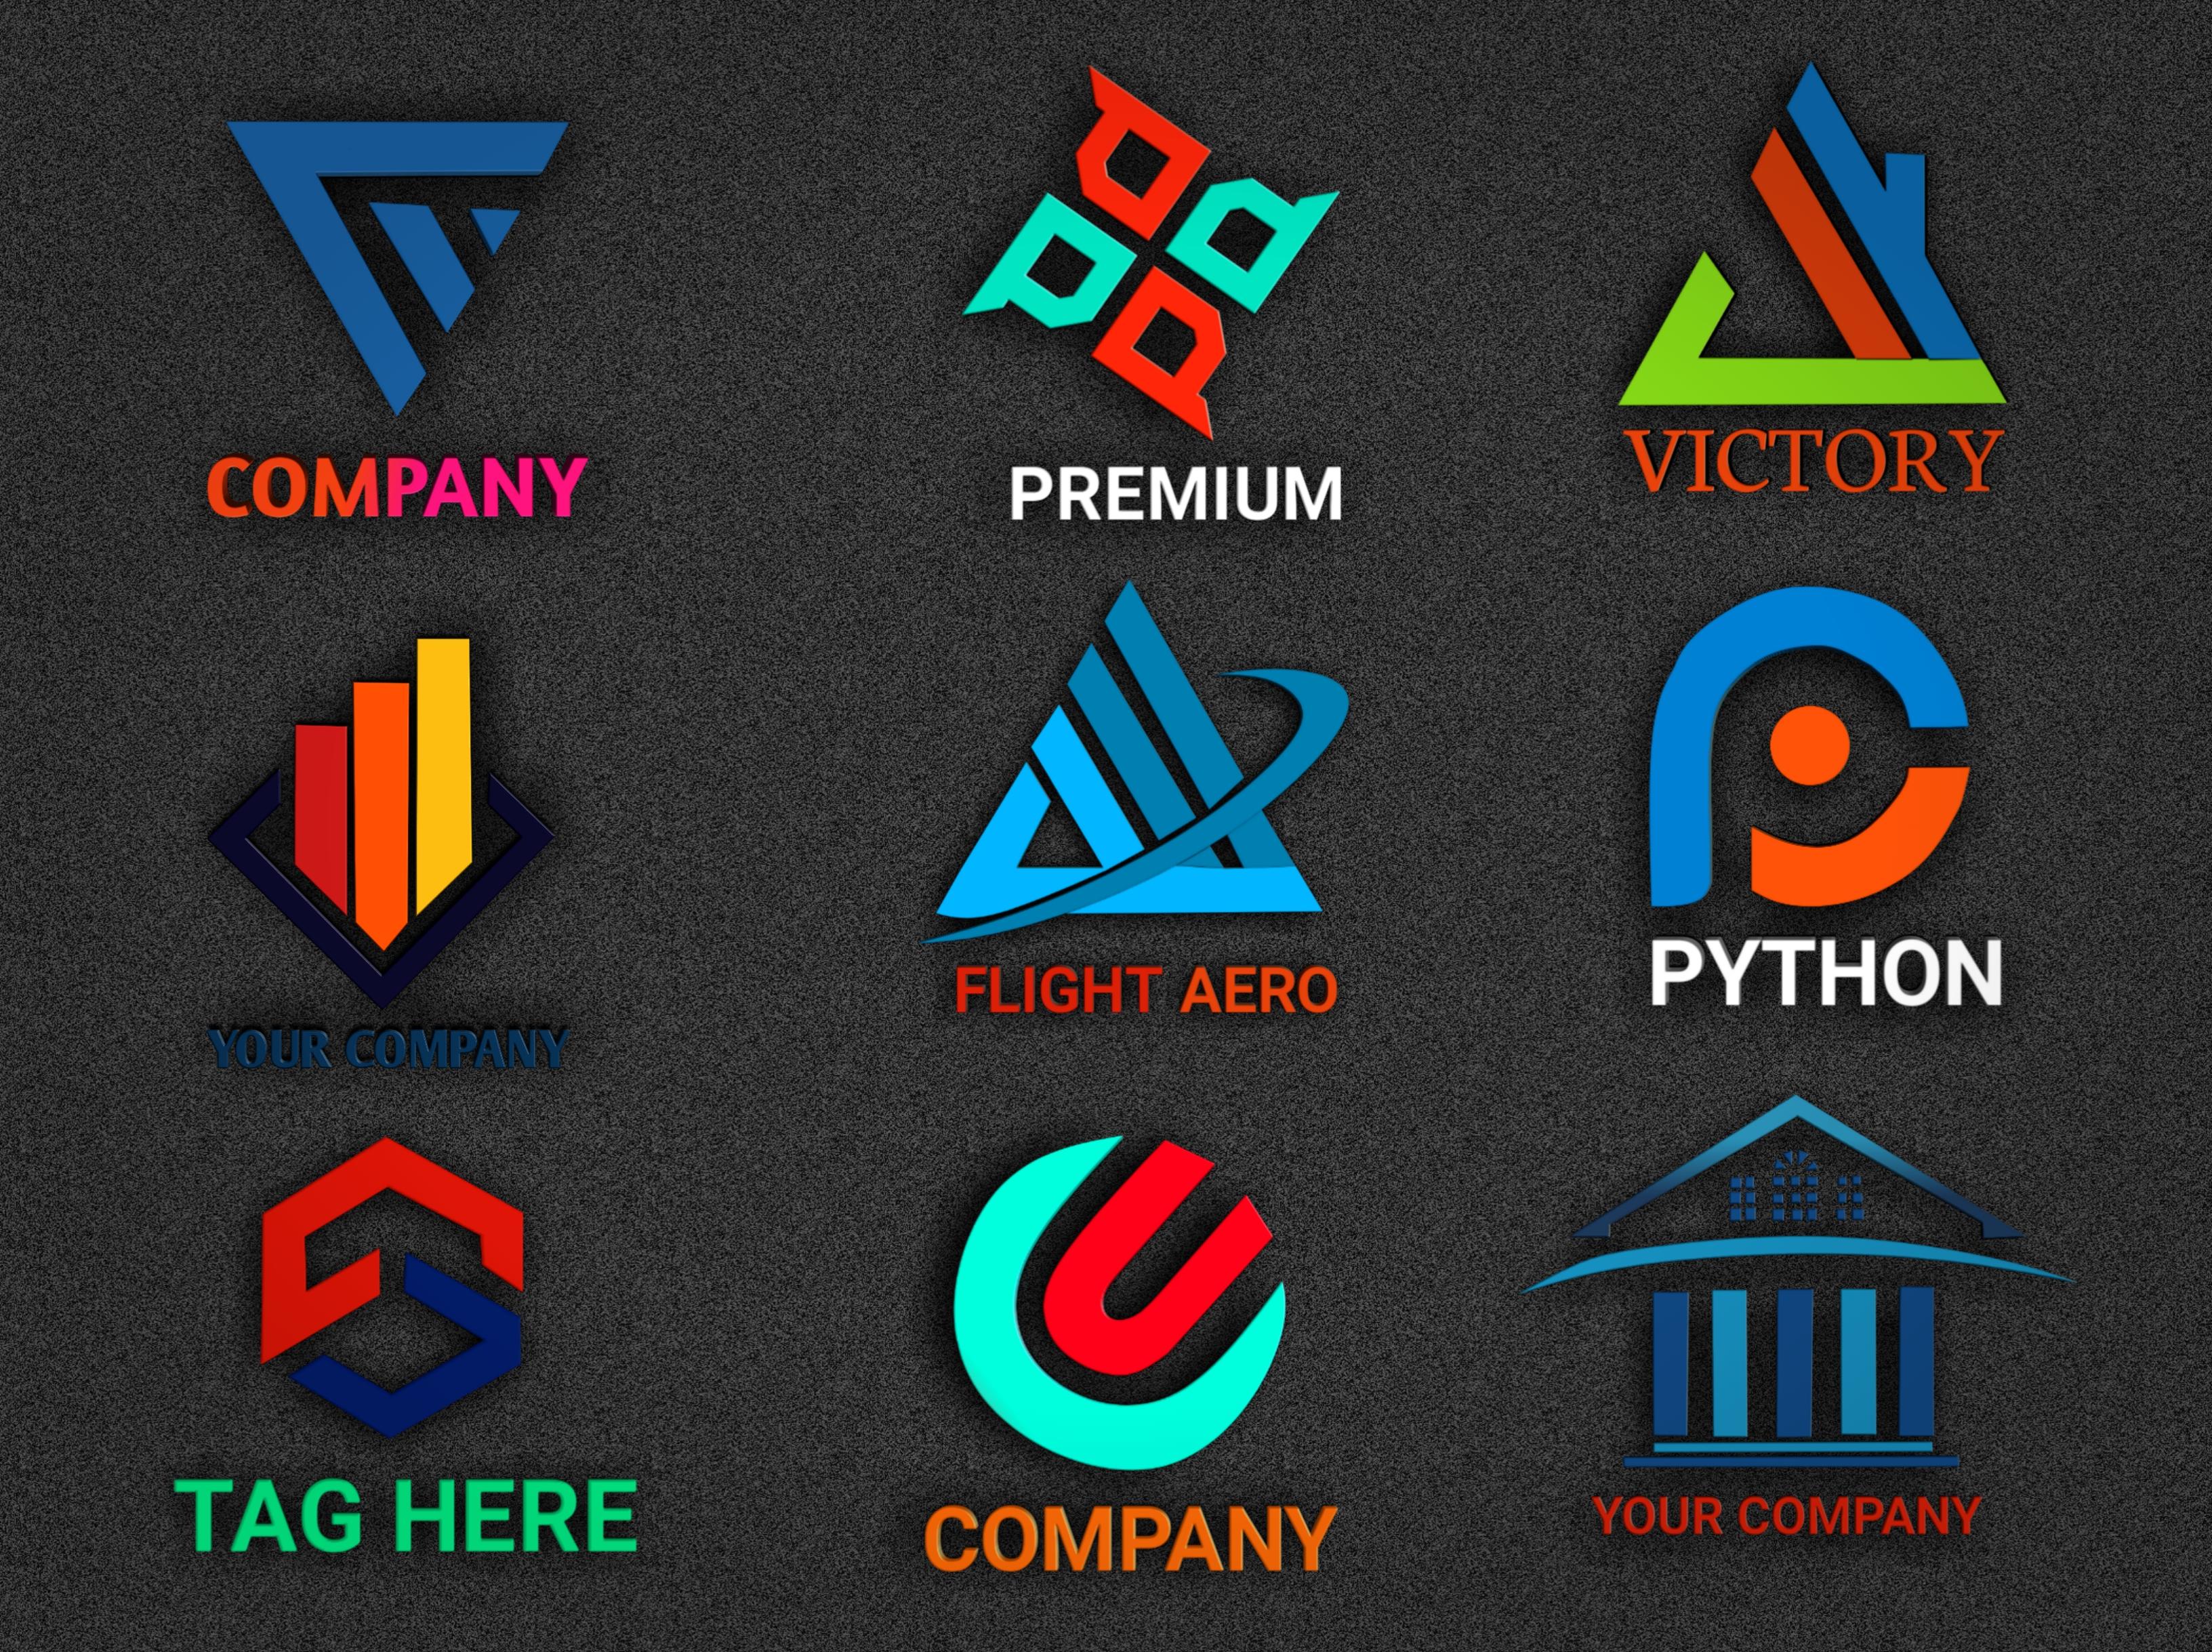 I will do any quality logo design for your business